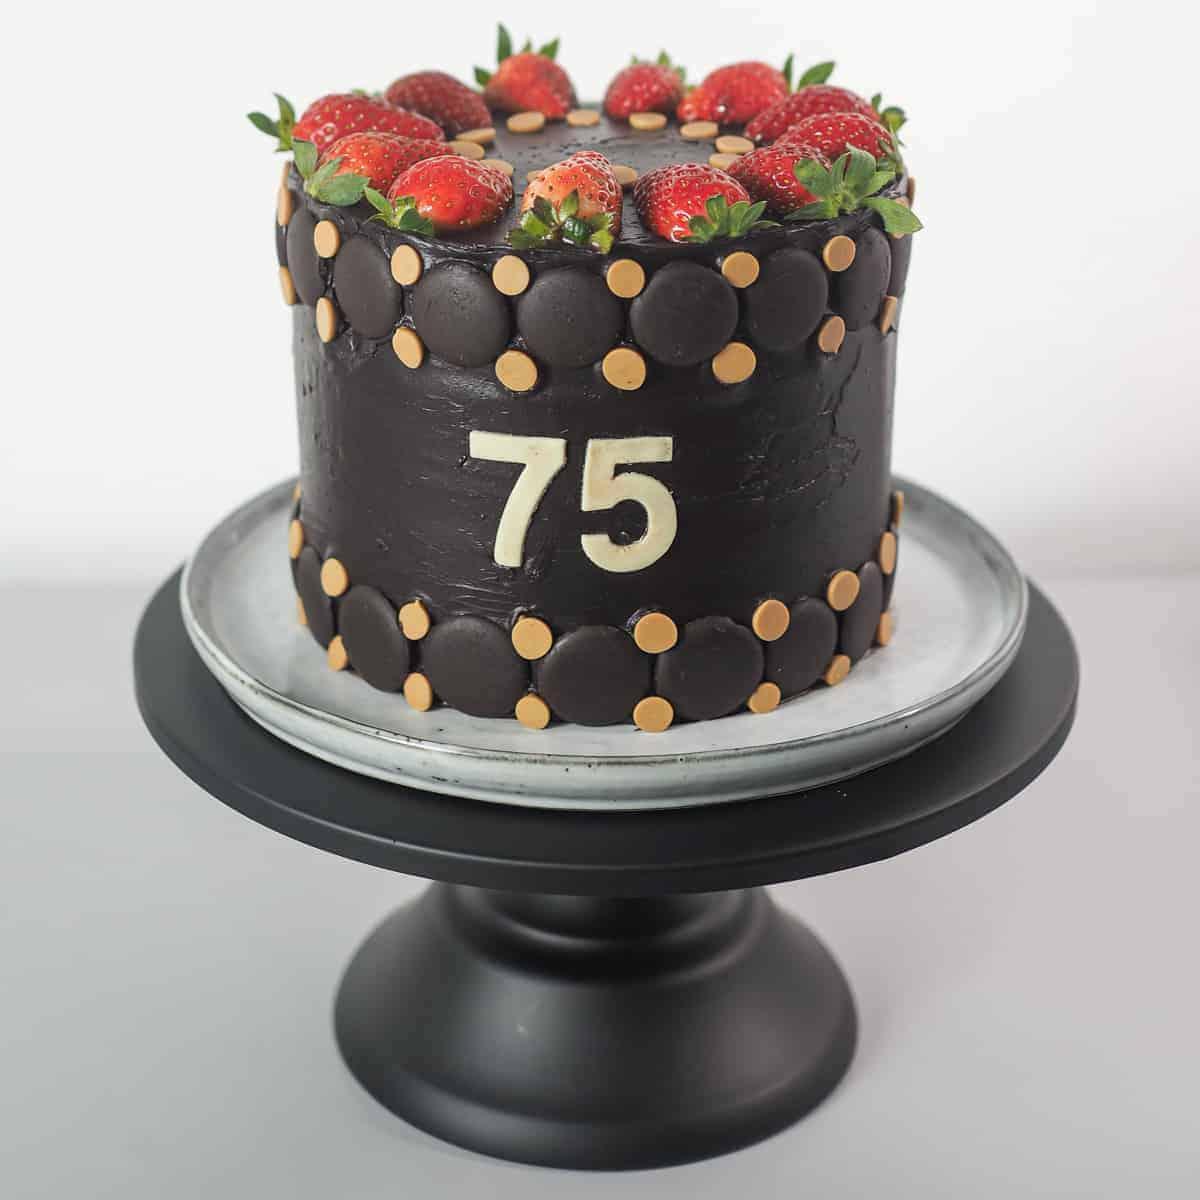 75th Birthday Cake Idea For Dad Decorated Treats